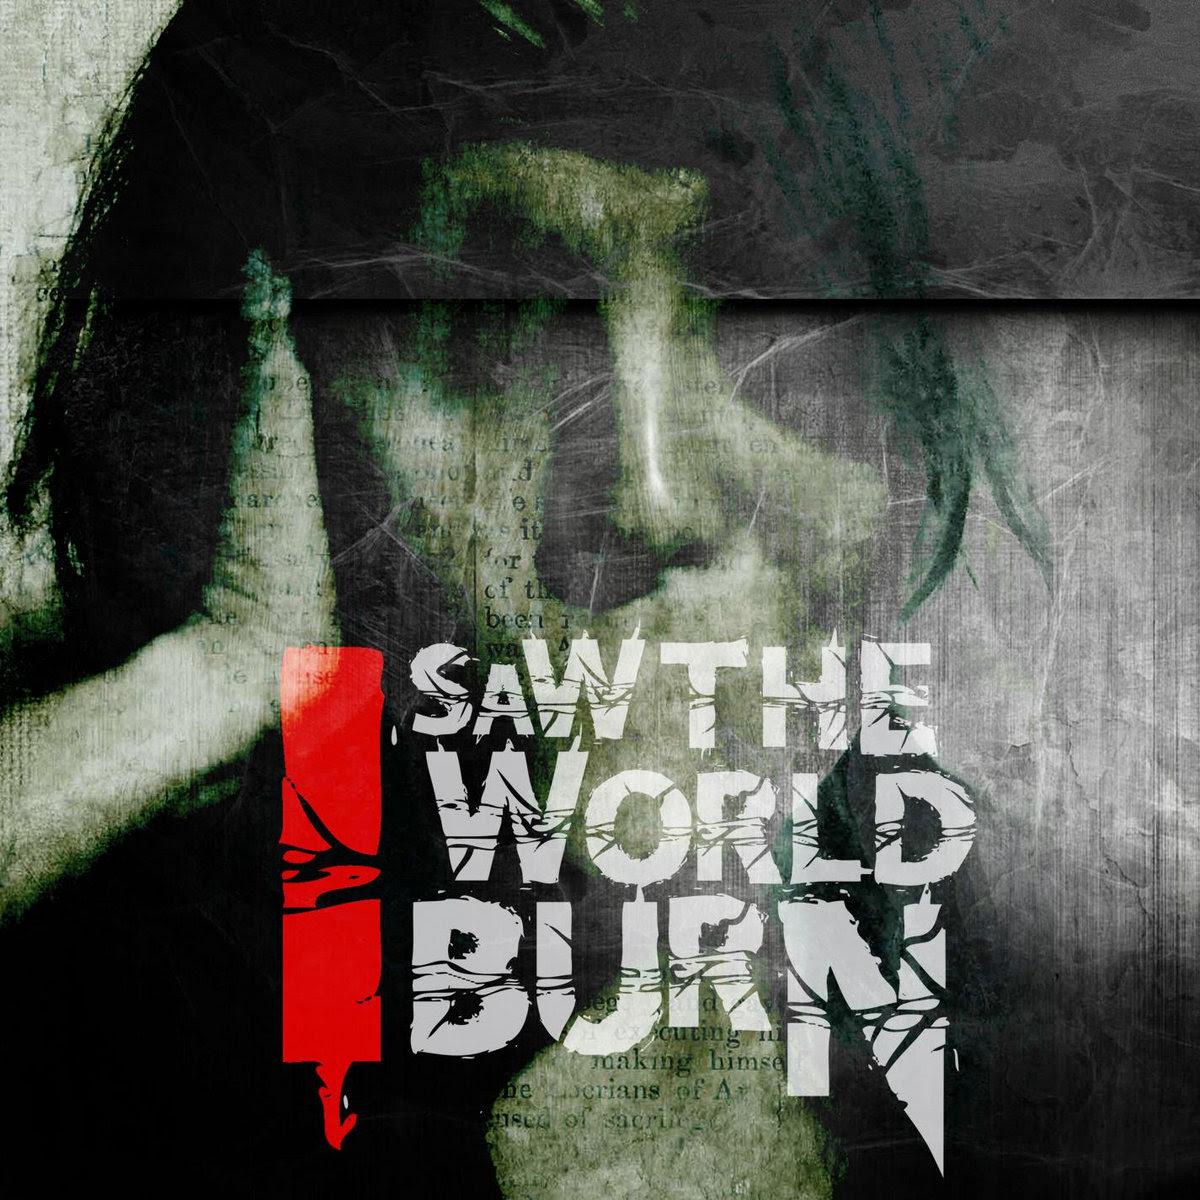 www.facebook.com/isawtheworldburn